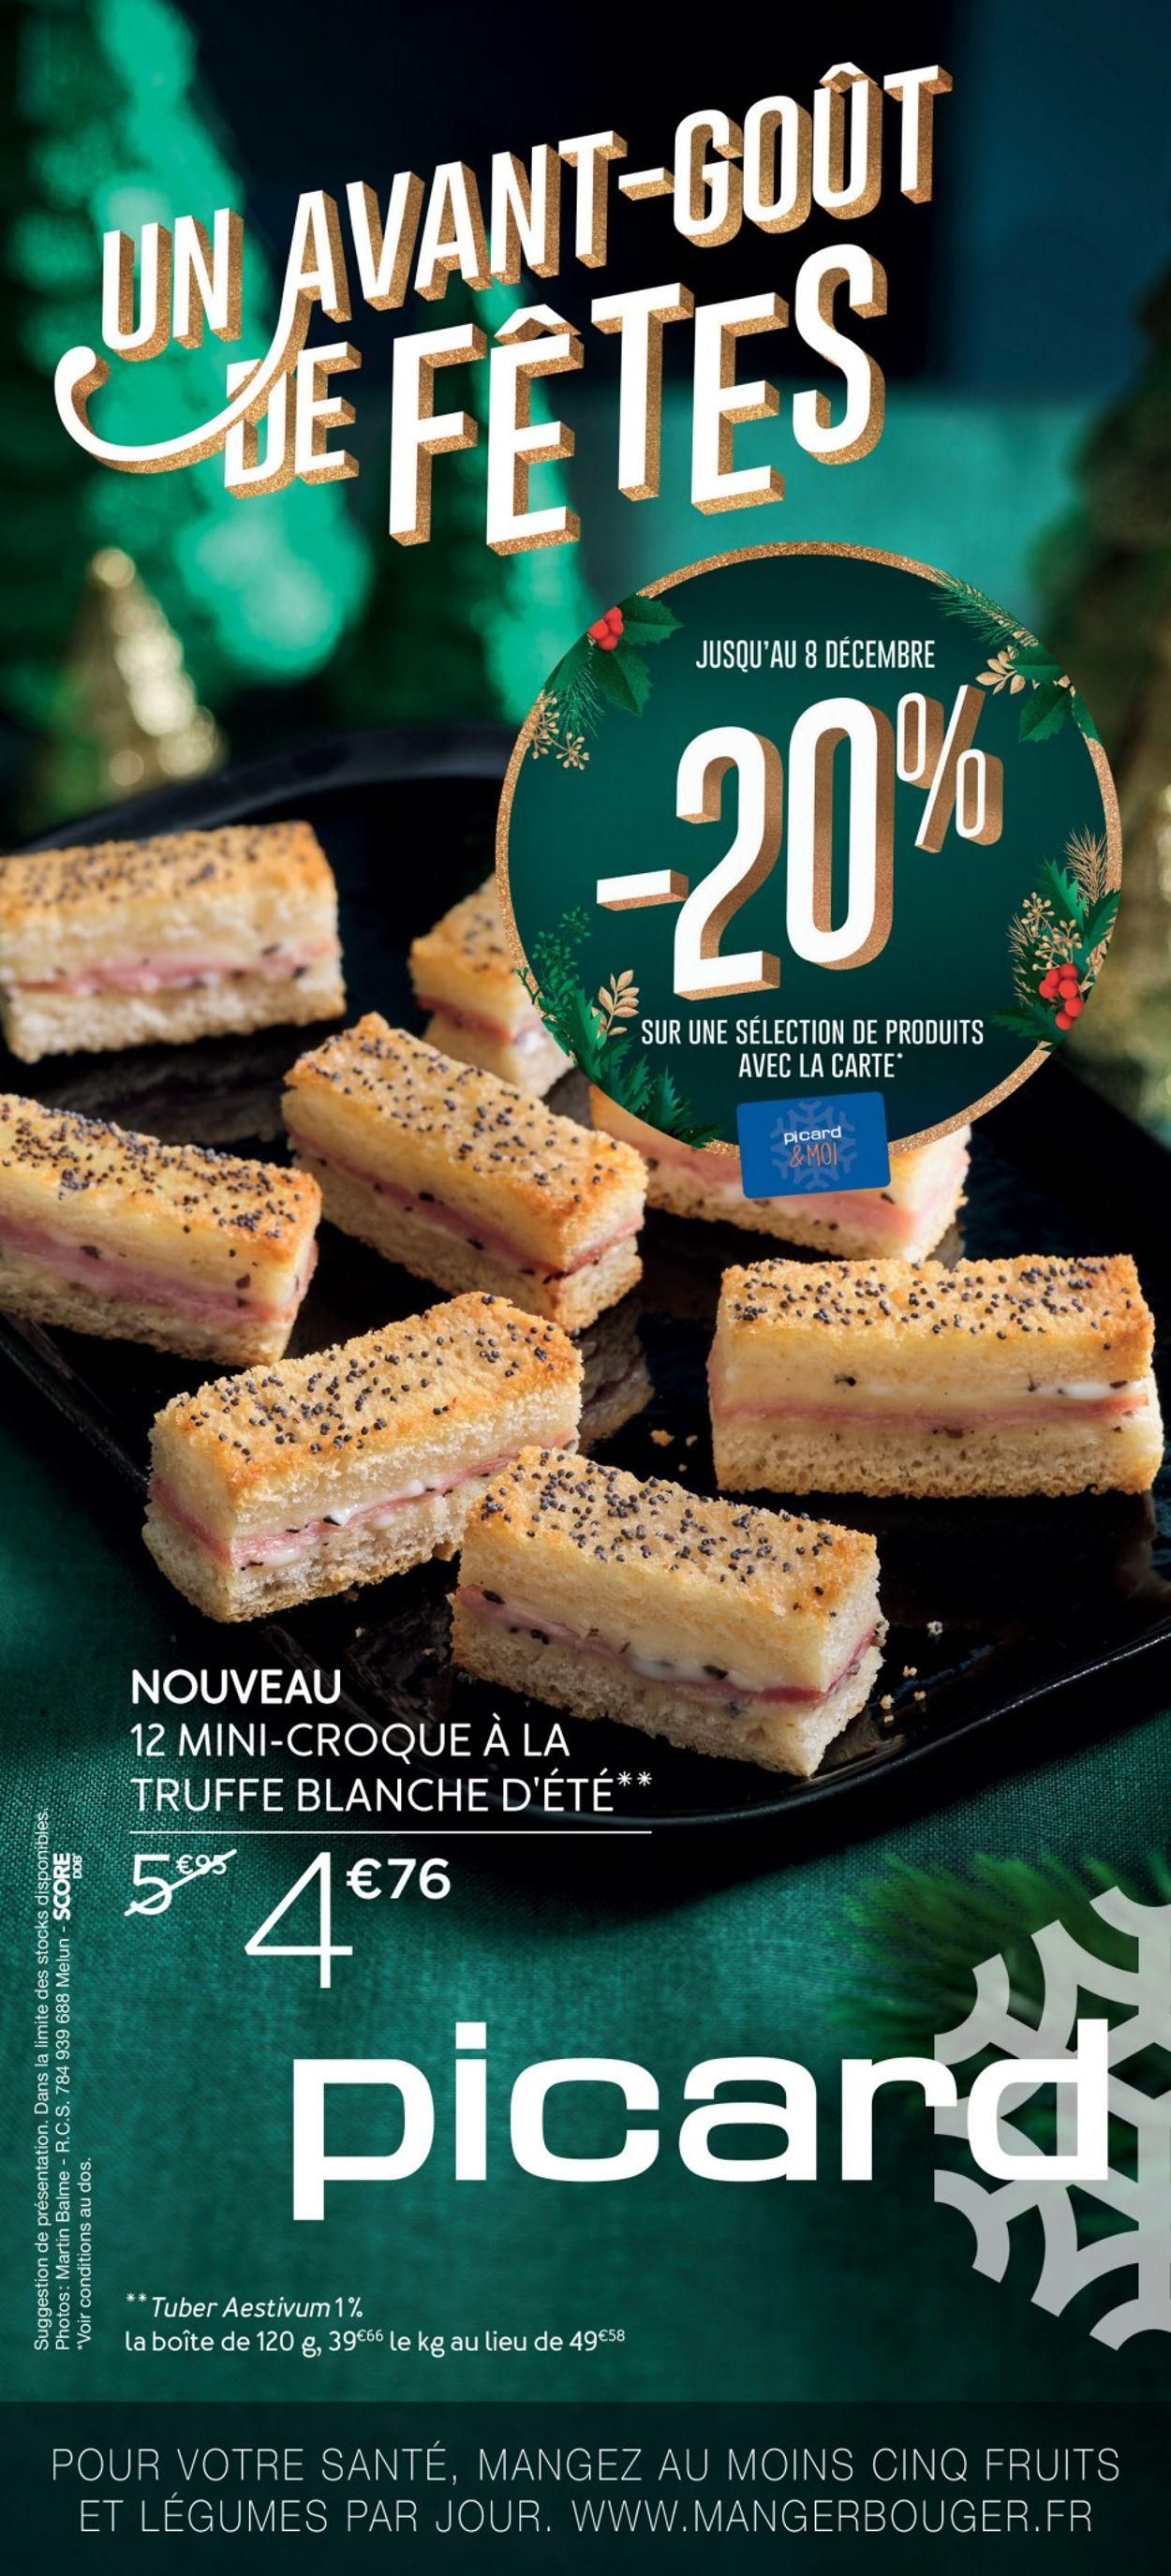 Picard catalogue de Noël 2019 Catalogue - 18.11-08.12.2019